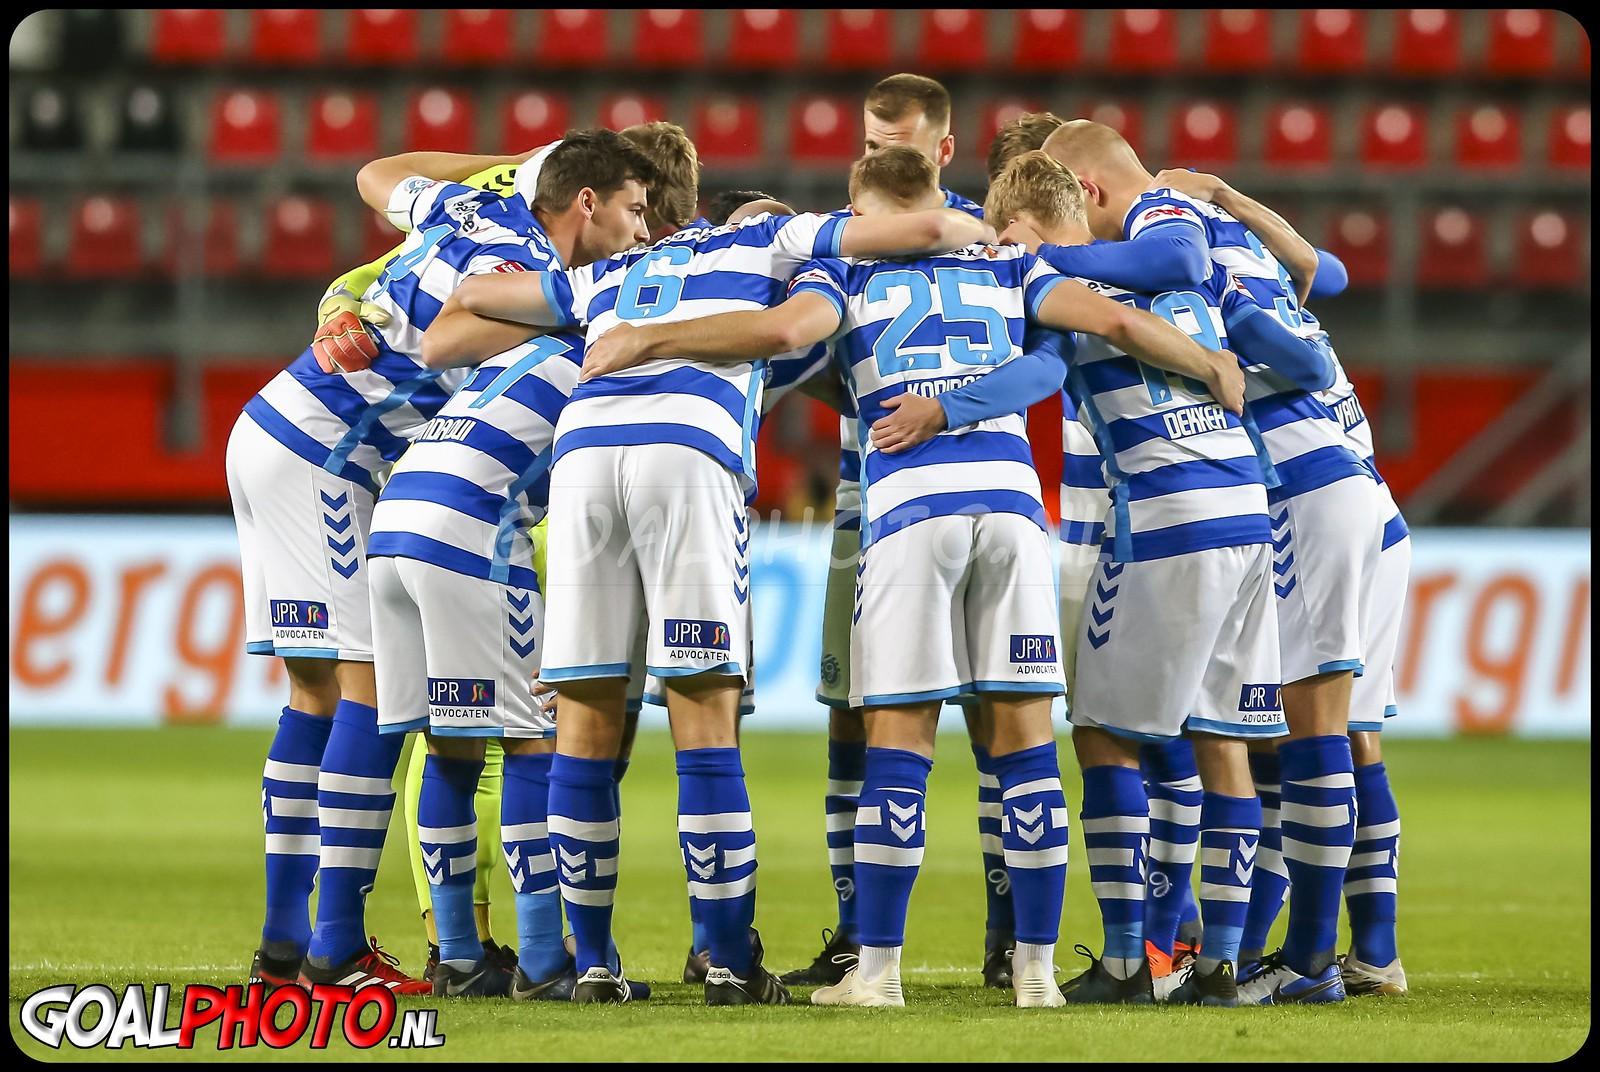 FC Twente - De Graafschap 27-10-2020